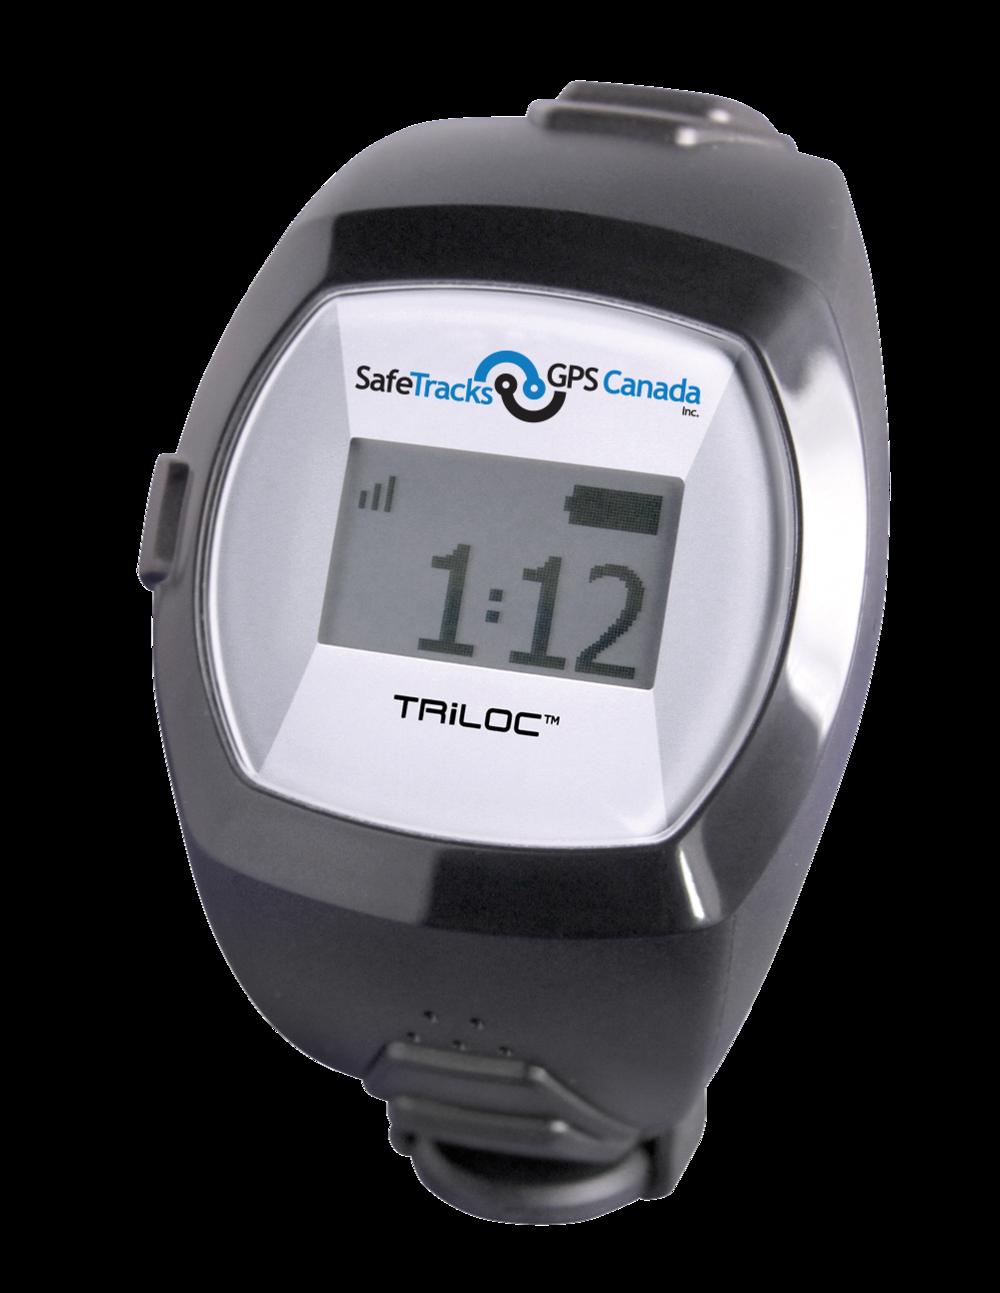 SafeTracks Triloc Wristwatch